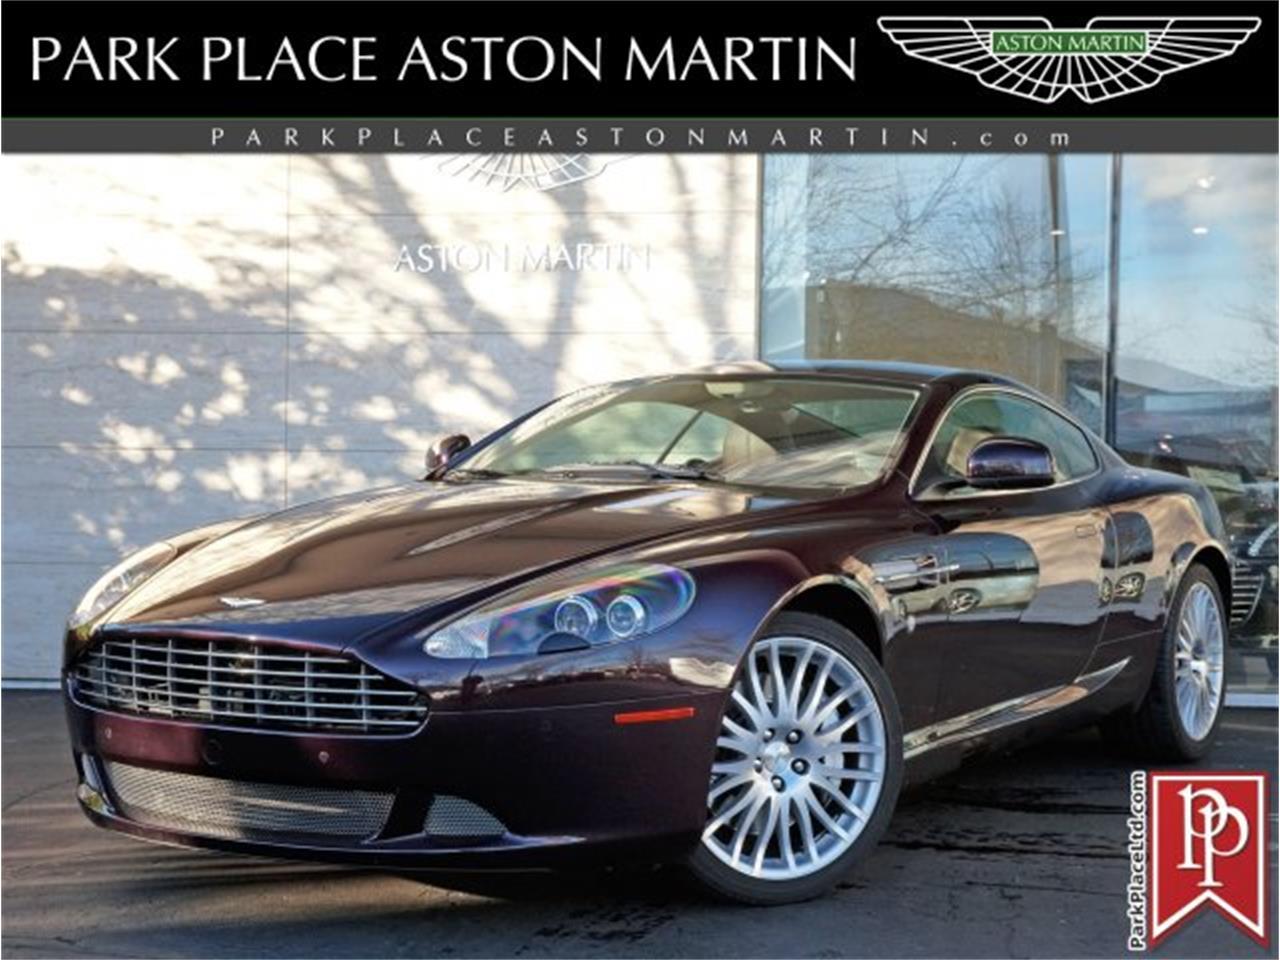 Aston Martin DB For Sale ClassicCarscom CC - Park place aston martin